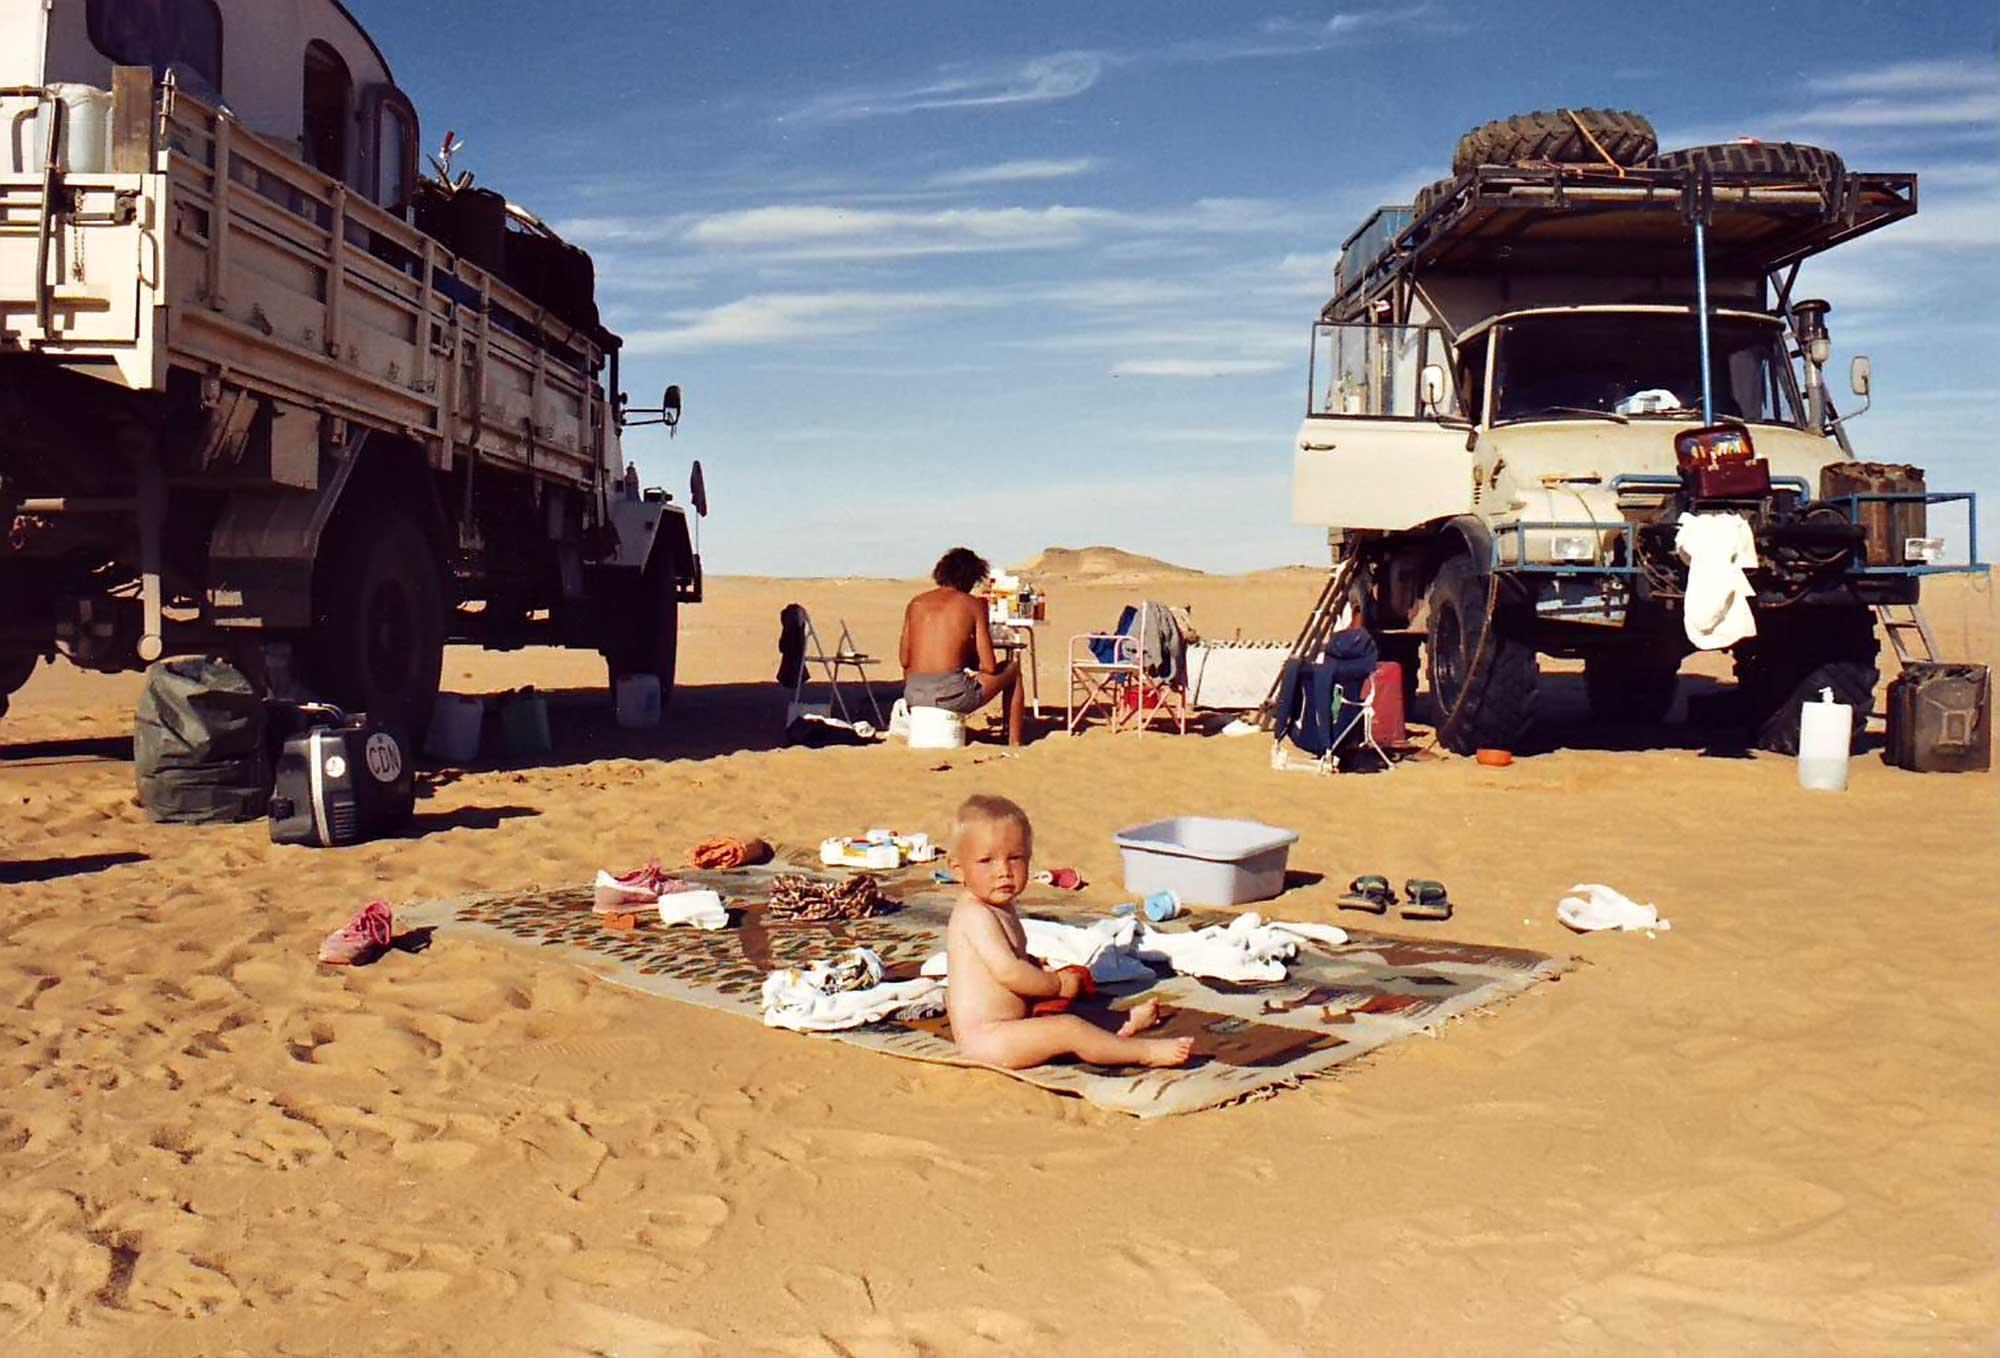 camping-desert-sudan-africa-baby-nisa